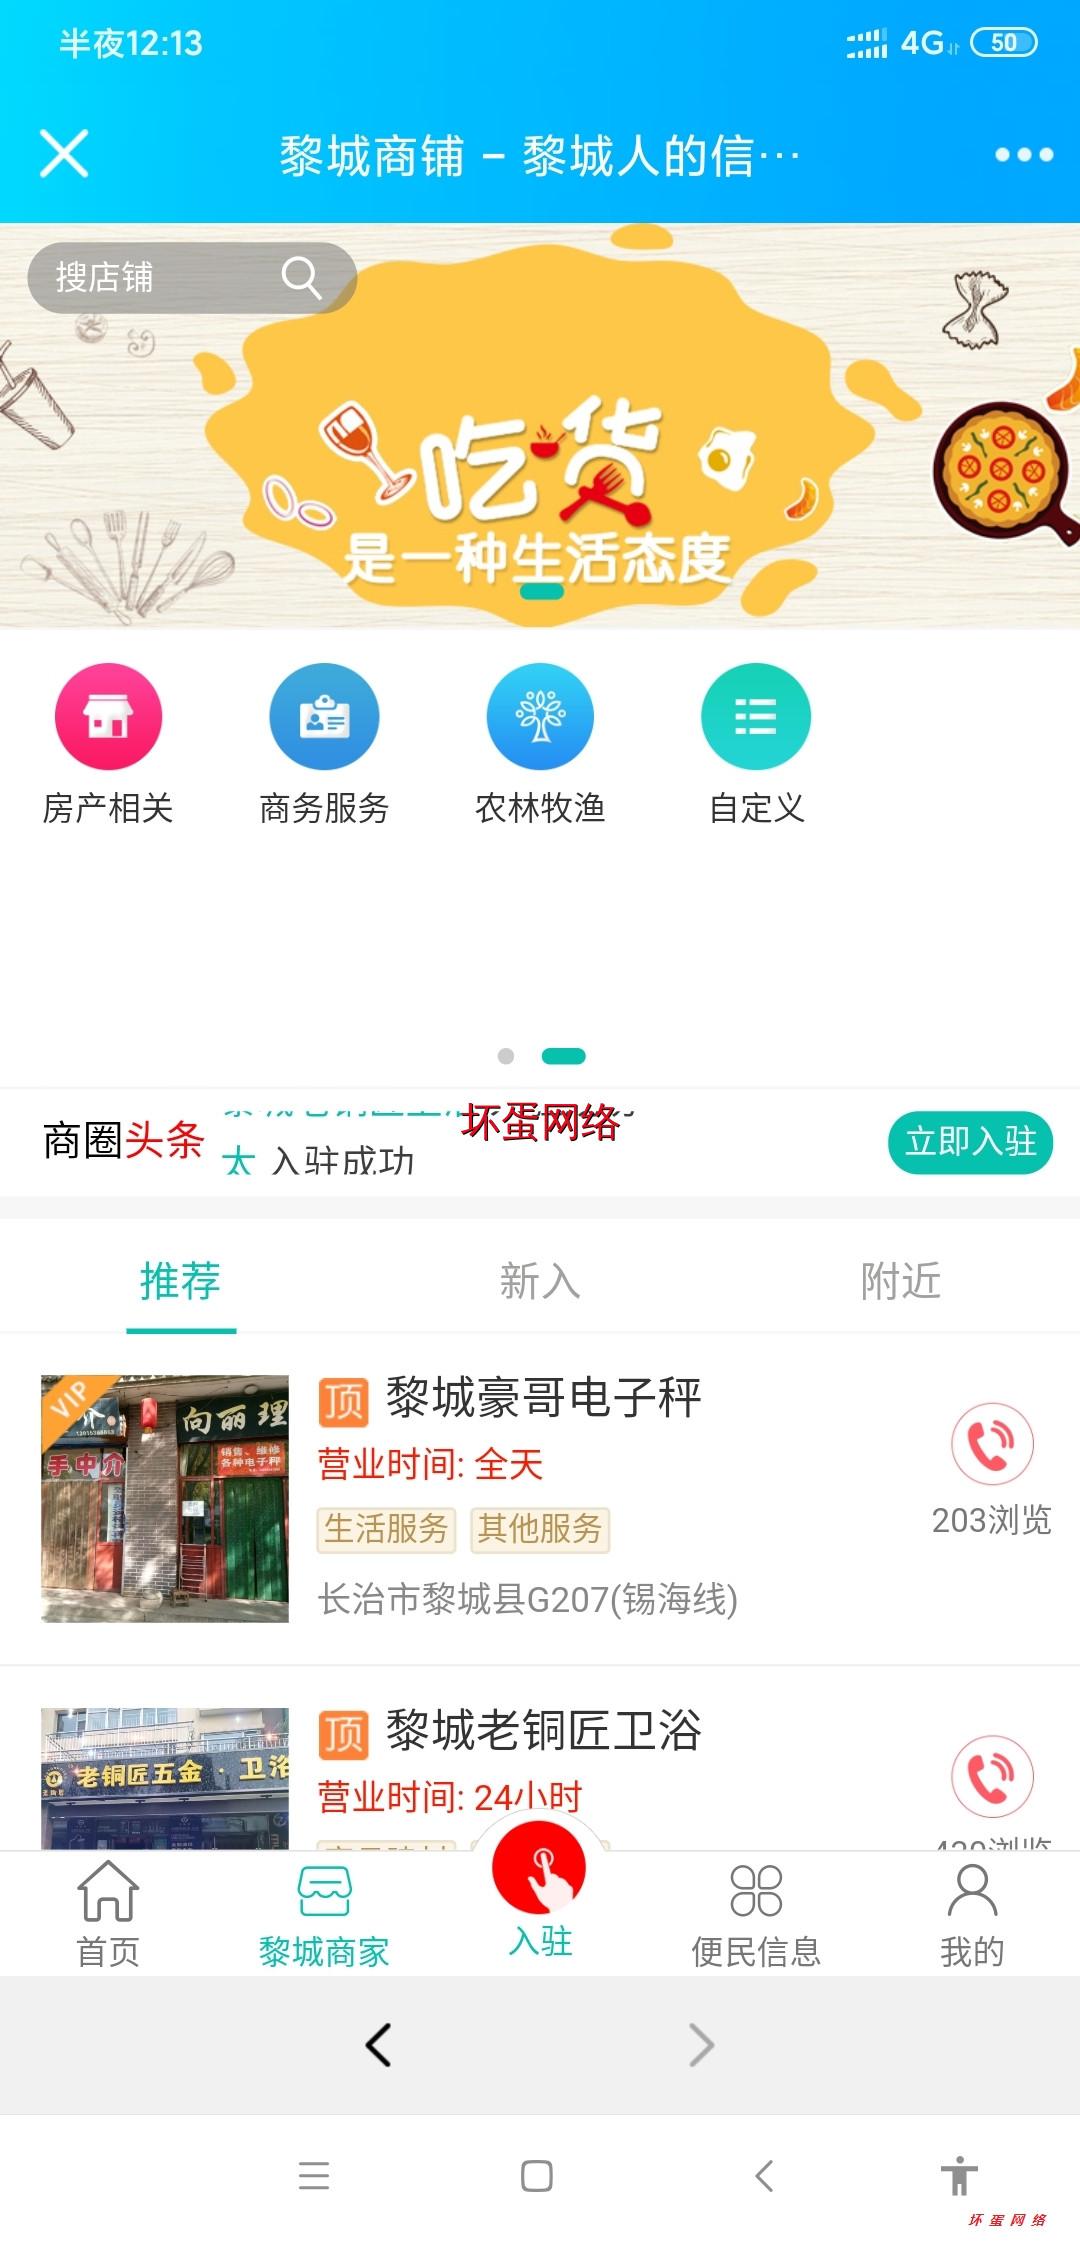 Screenshot_2019-12-25-00-13-56-762_com.tencent.mo.jpg